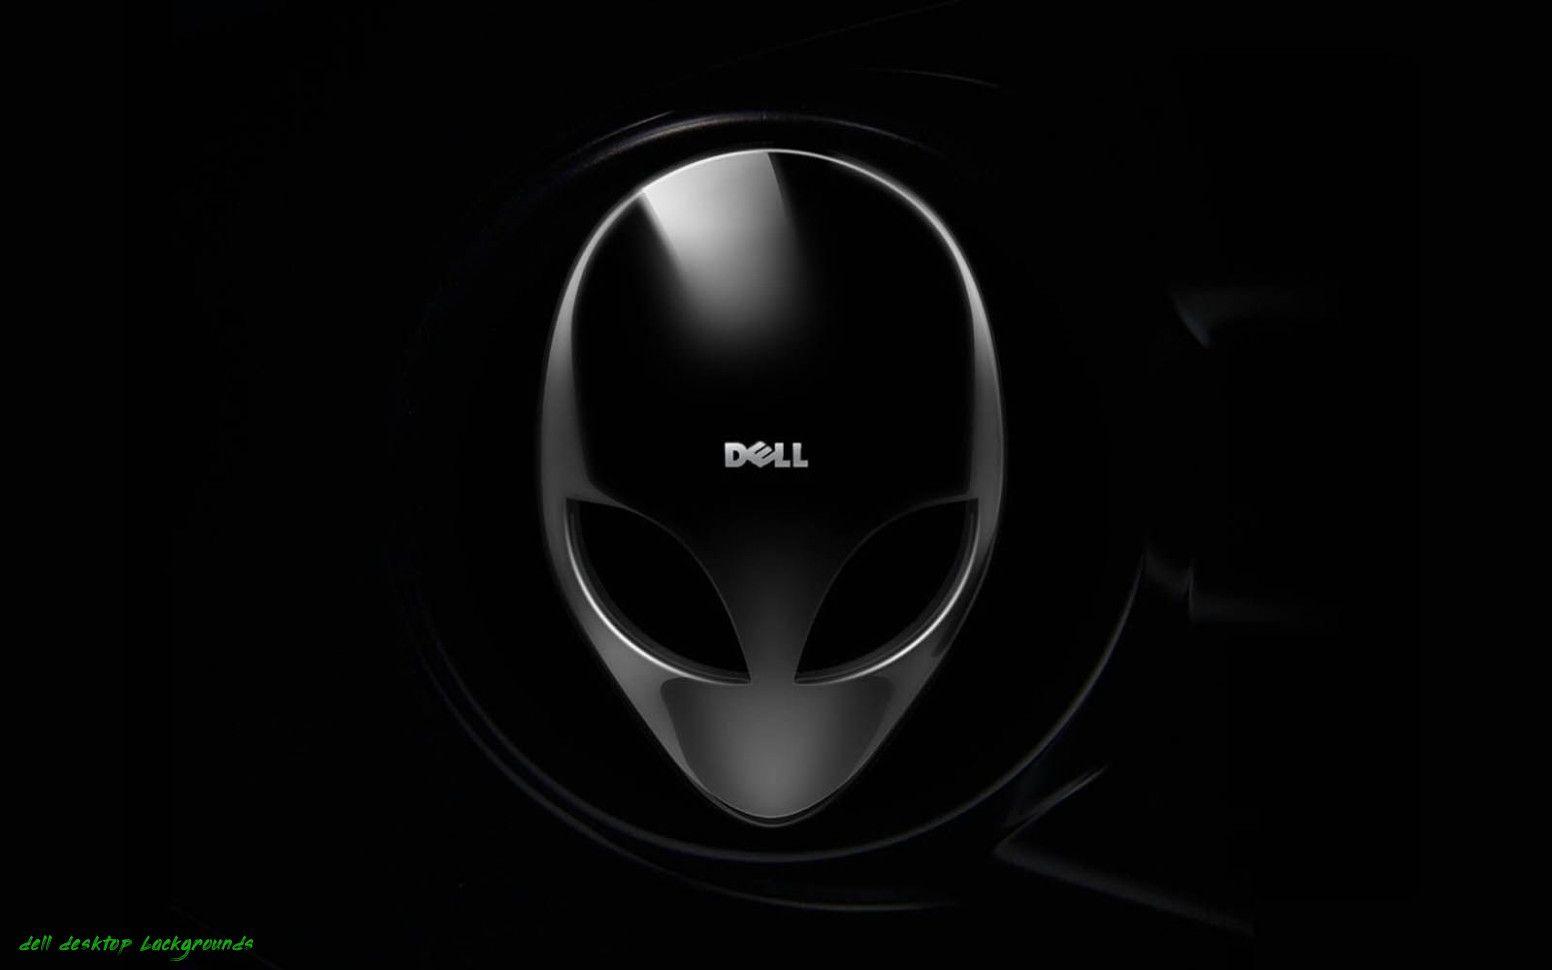 Download Wallpapers Dell 4k 3d Logo Blue Backgroud Dell Logo Besthqwallpapers Com Dell Logo Hd Wallpapers For Laptop Logo Wallpaper Hd